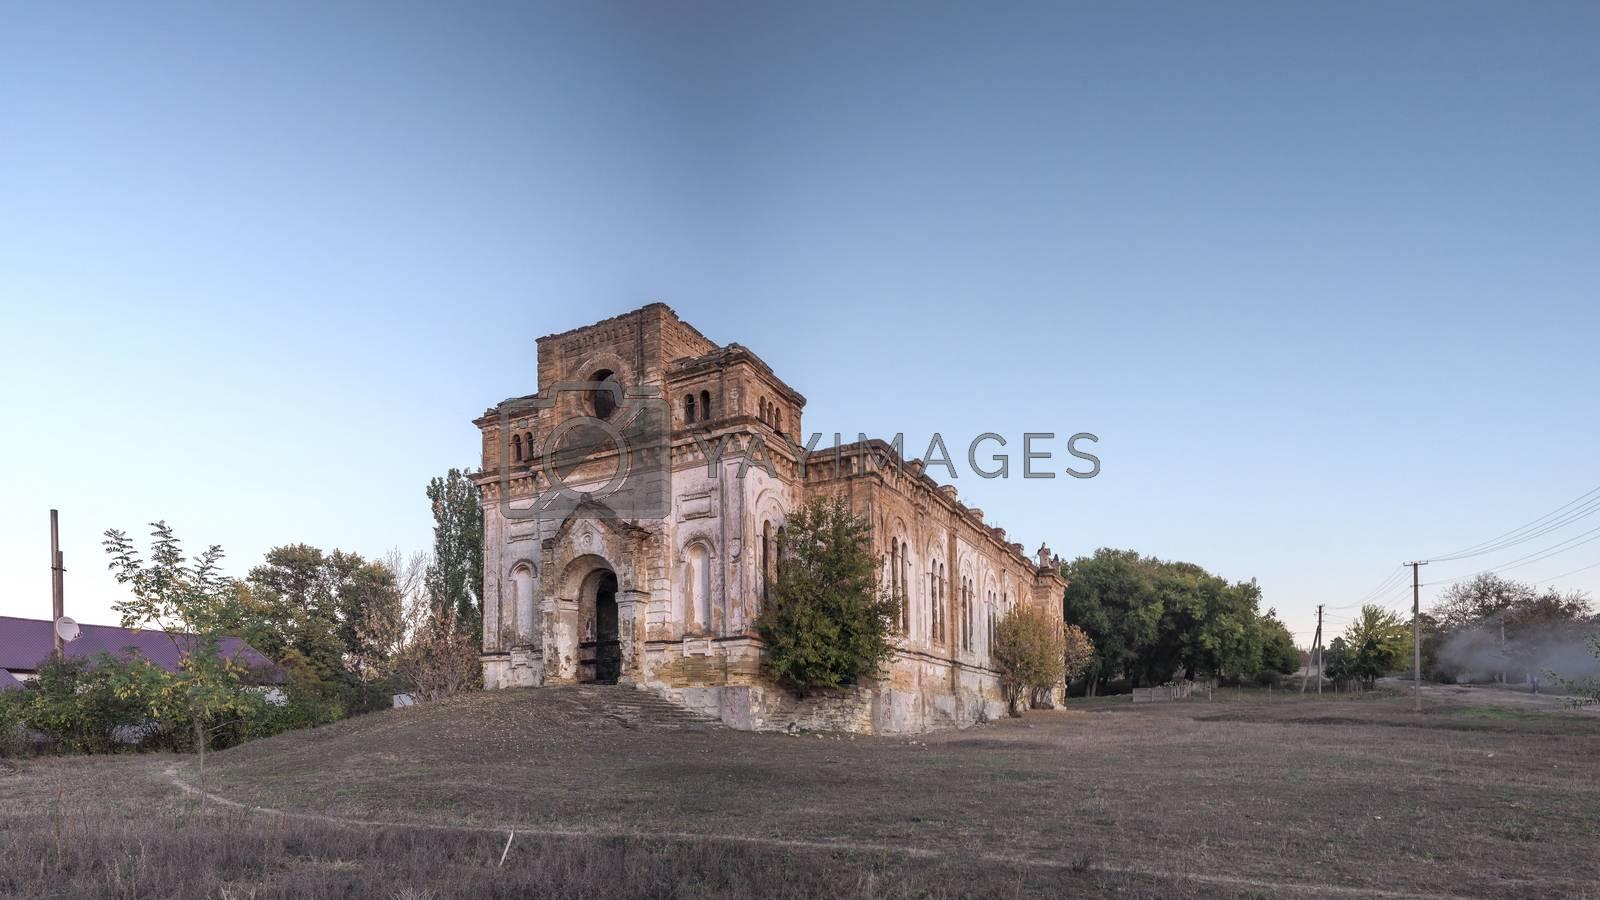 Abandoned church in Limanskoye, Ukraine by Sergii Zarev